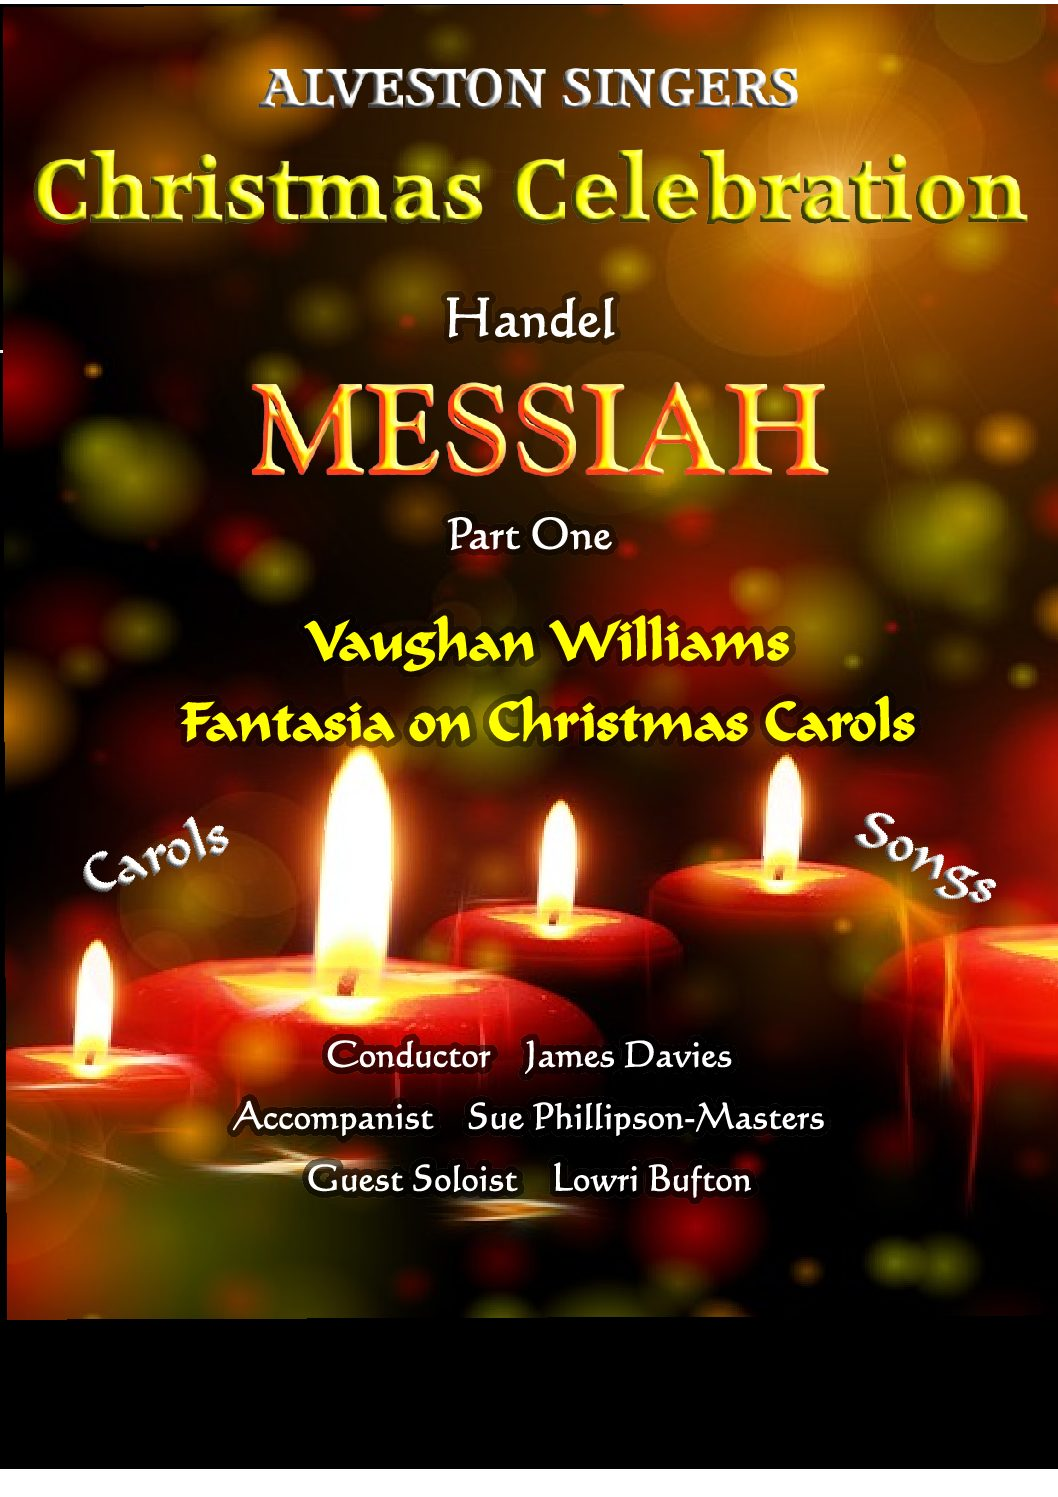 Alveston Singers Christmas Celebration!